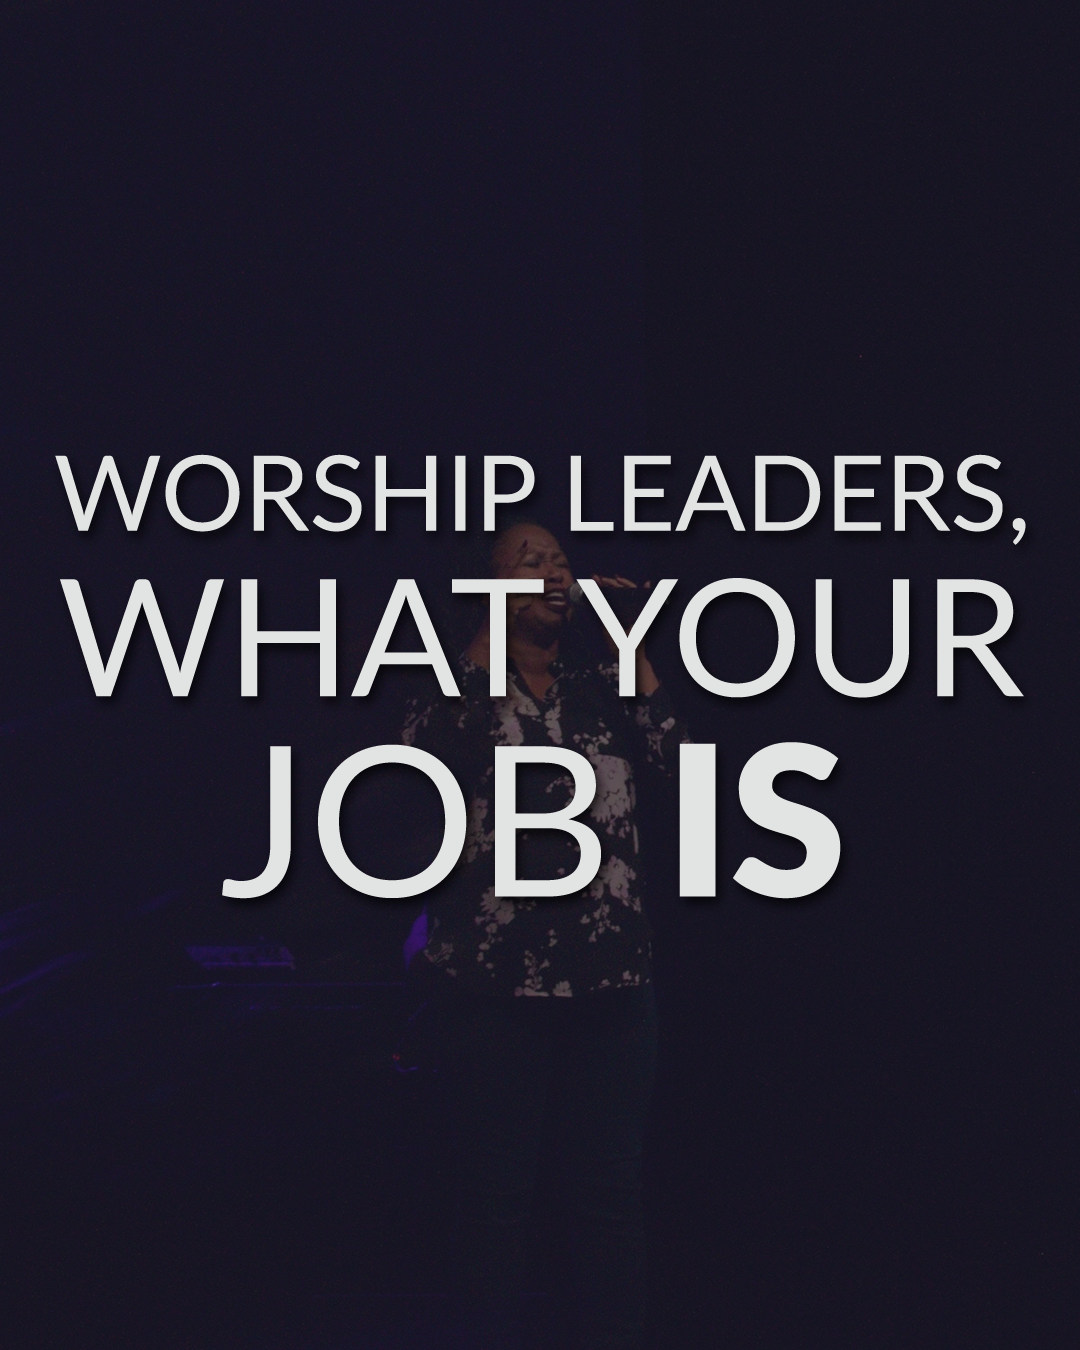 Worship leader responsibilities